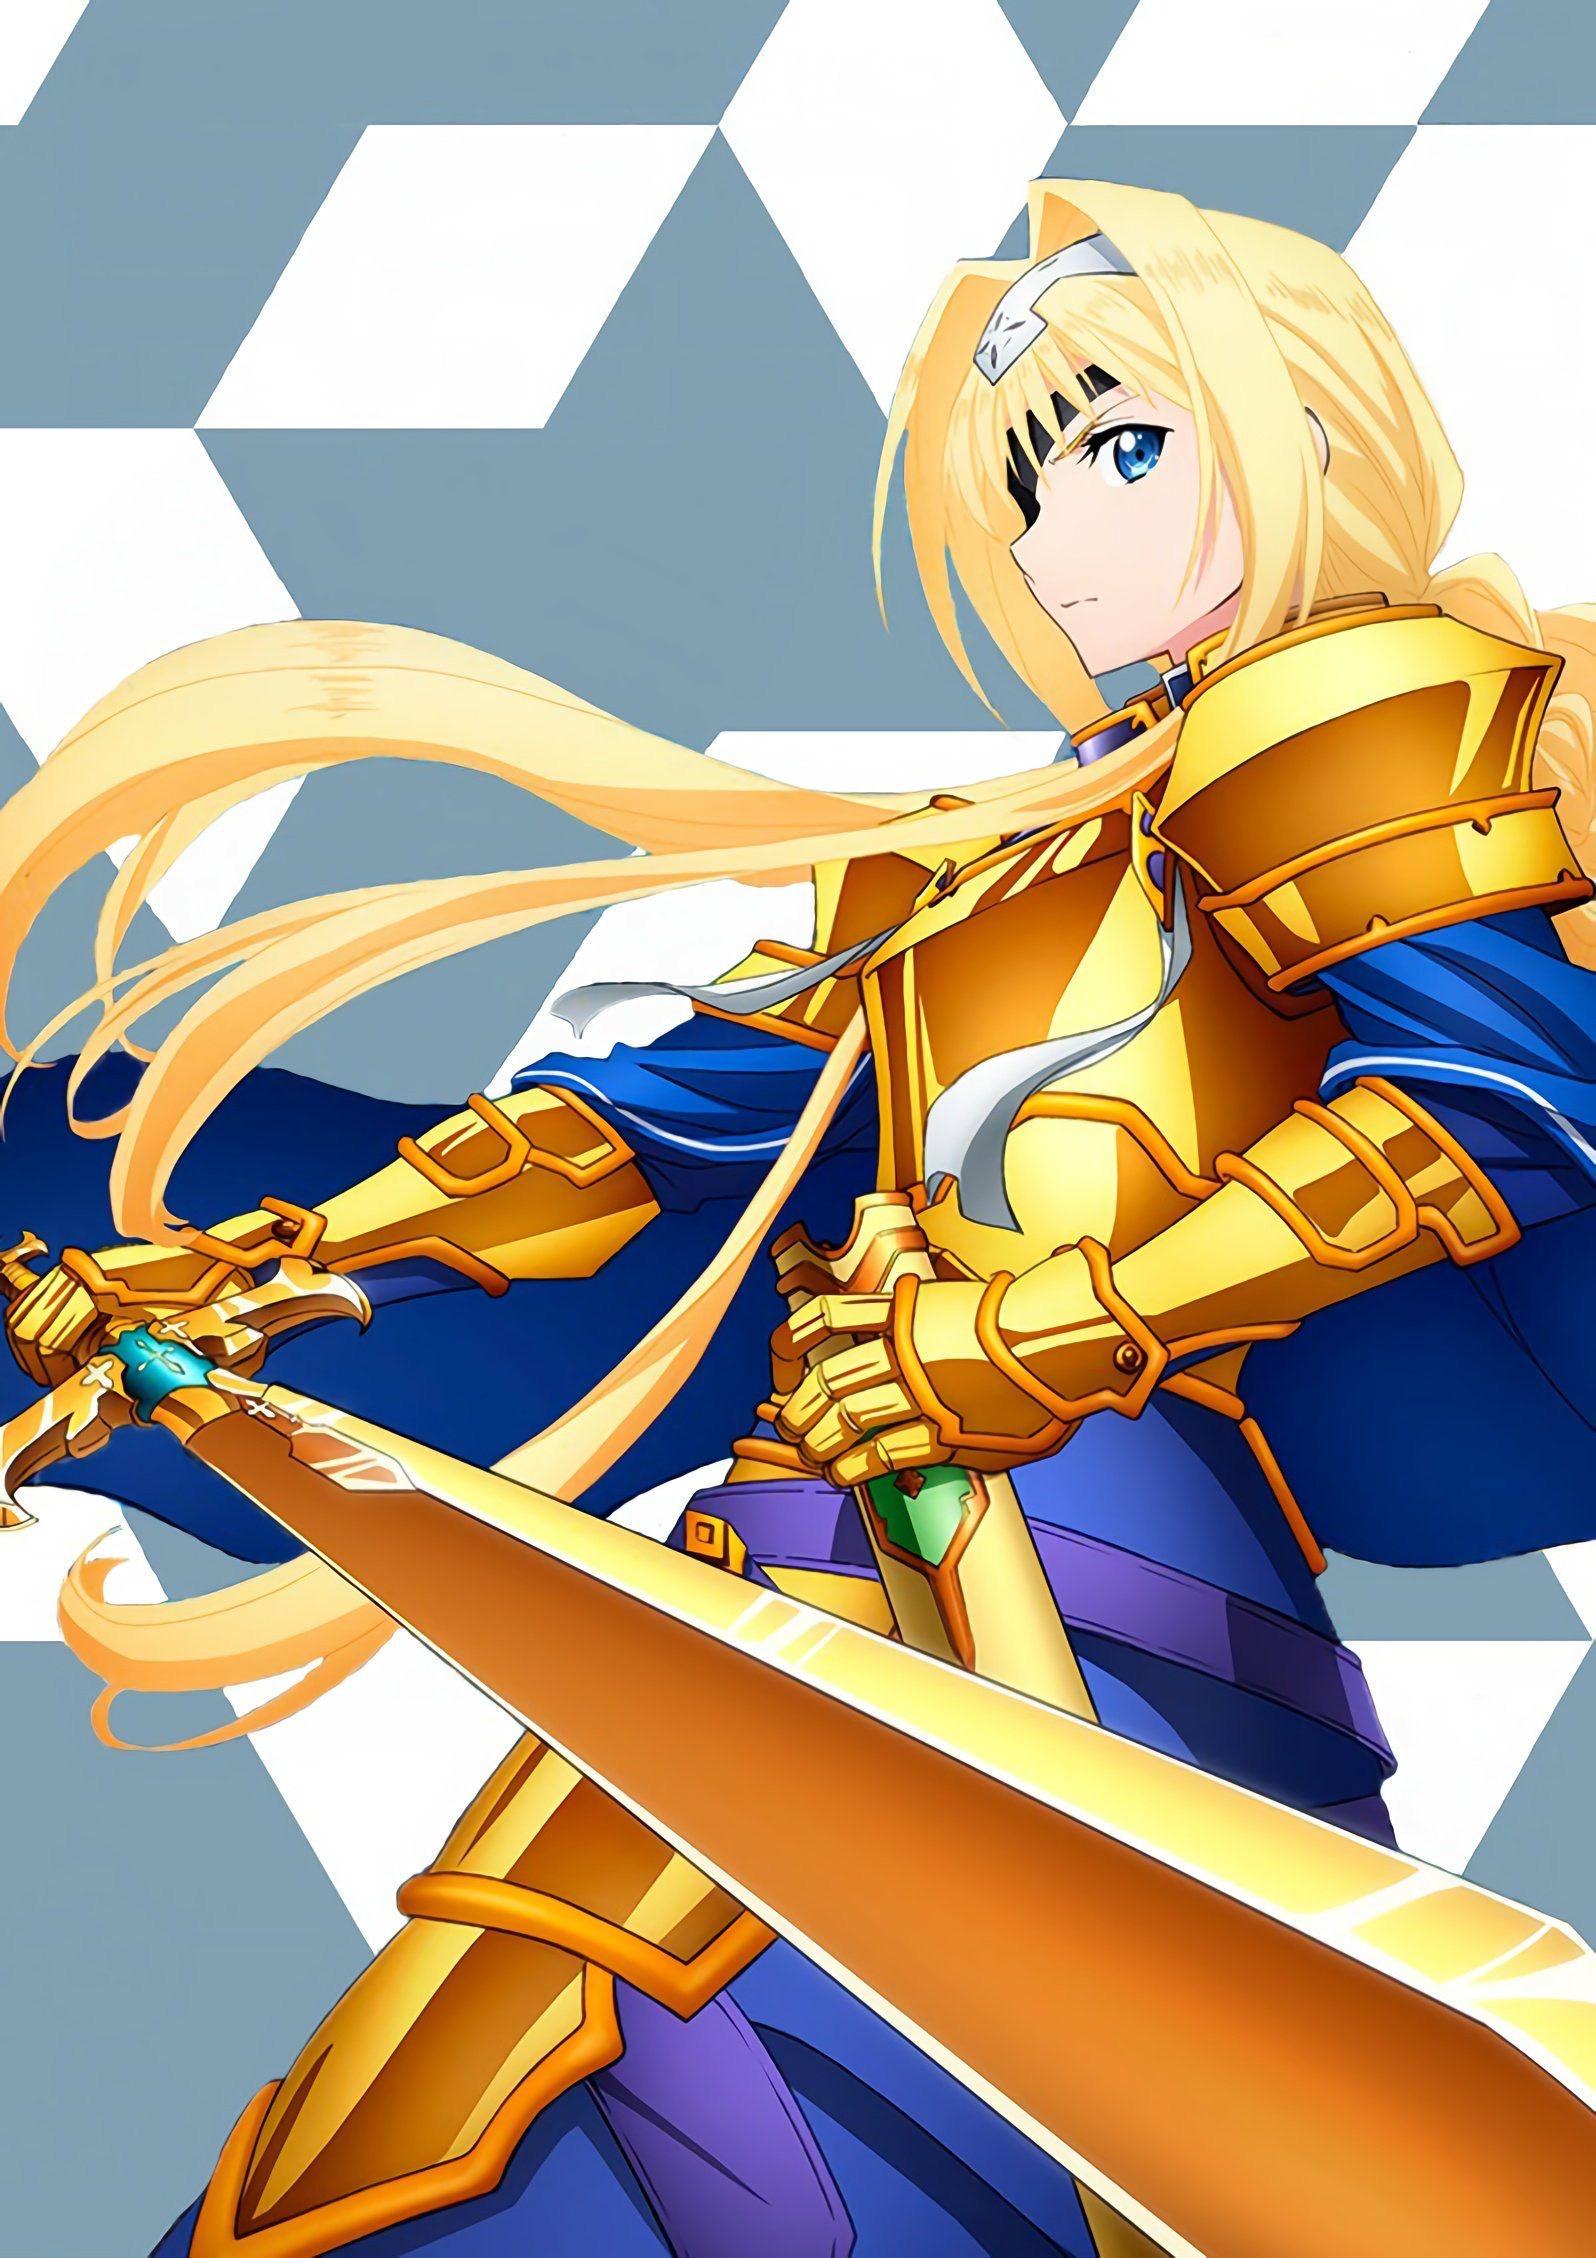 Sword Art Online のアイデア 投稿者 Sean Worrachart さん